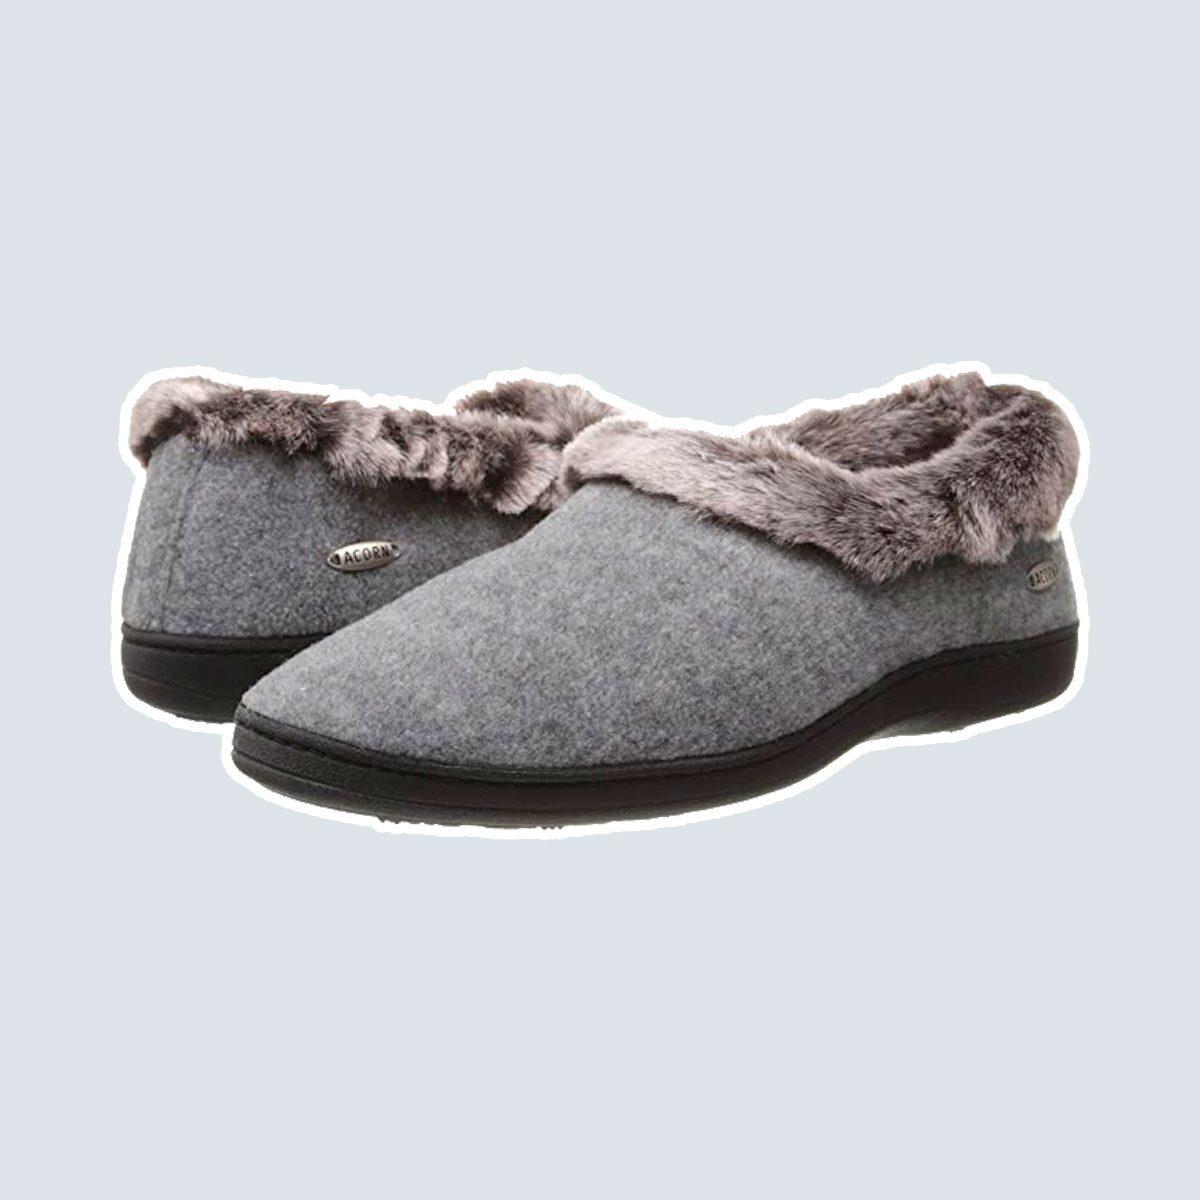 Ultra Soft slippers